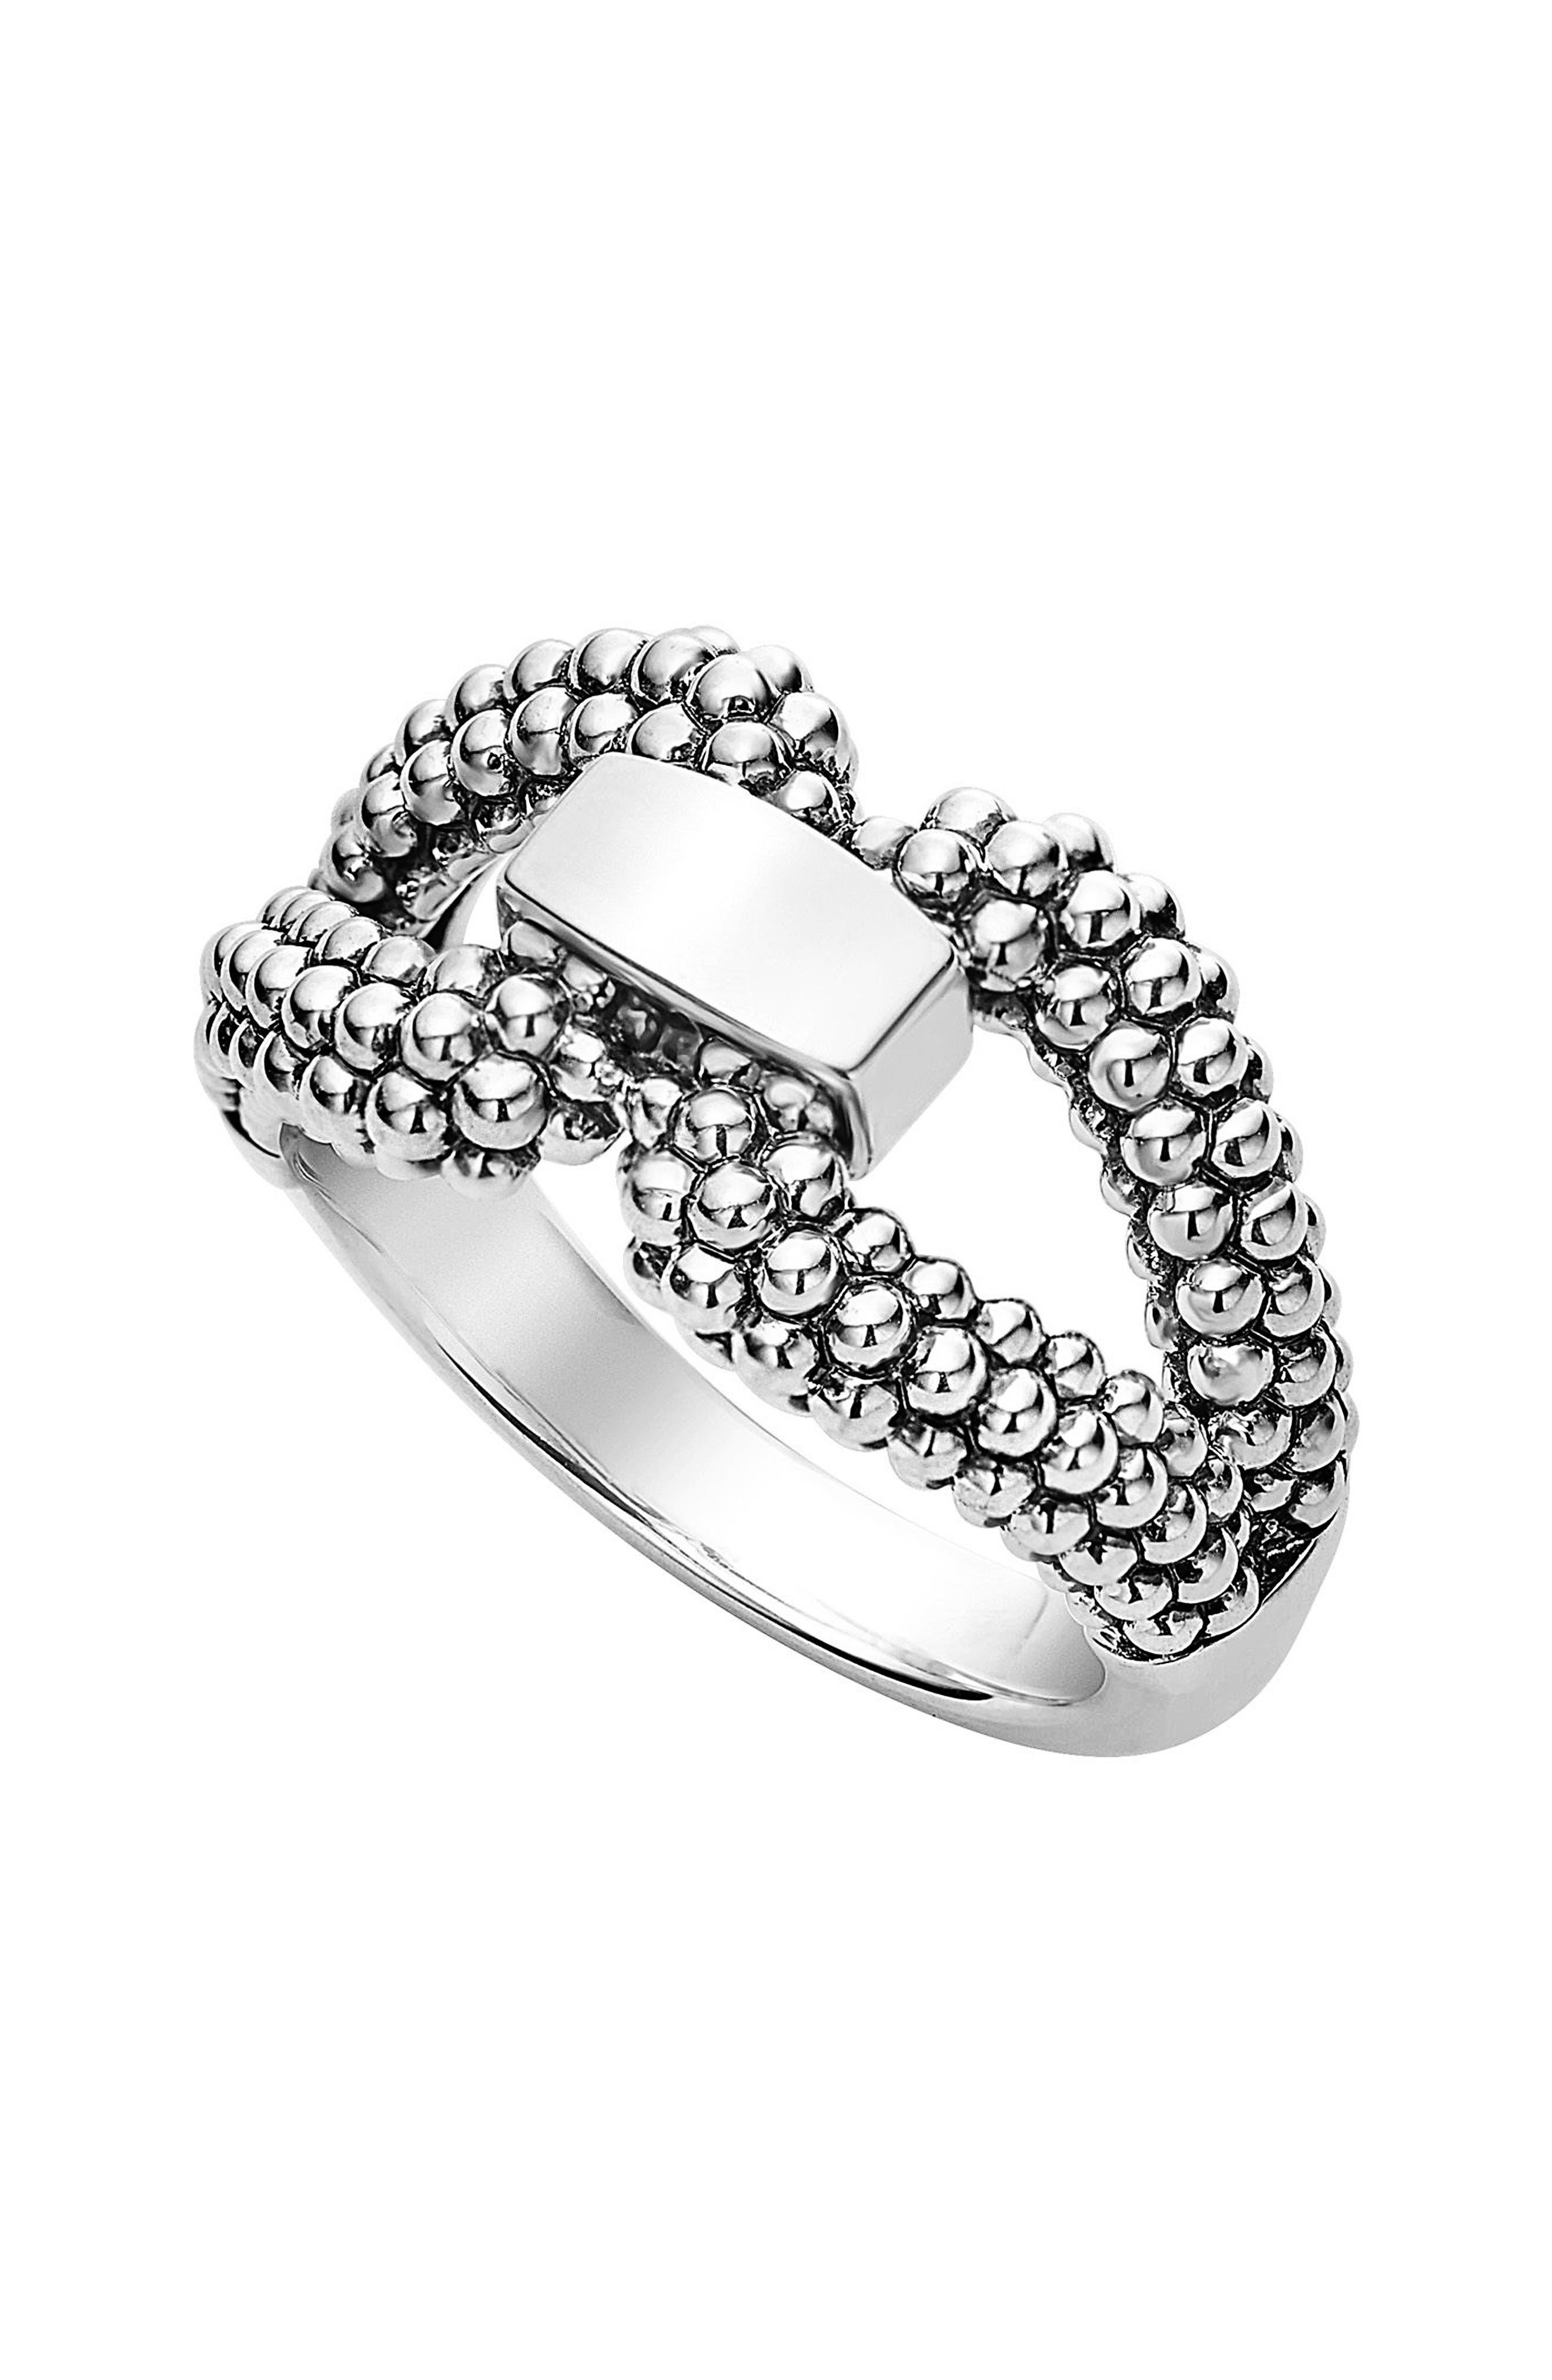 Derby Caviar Ring,                             Main thumbnail 1, color,                             Silver